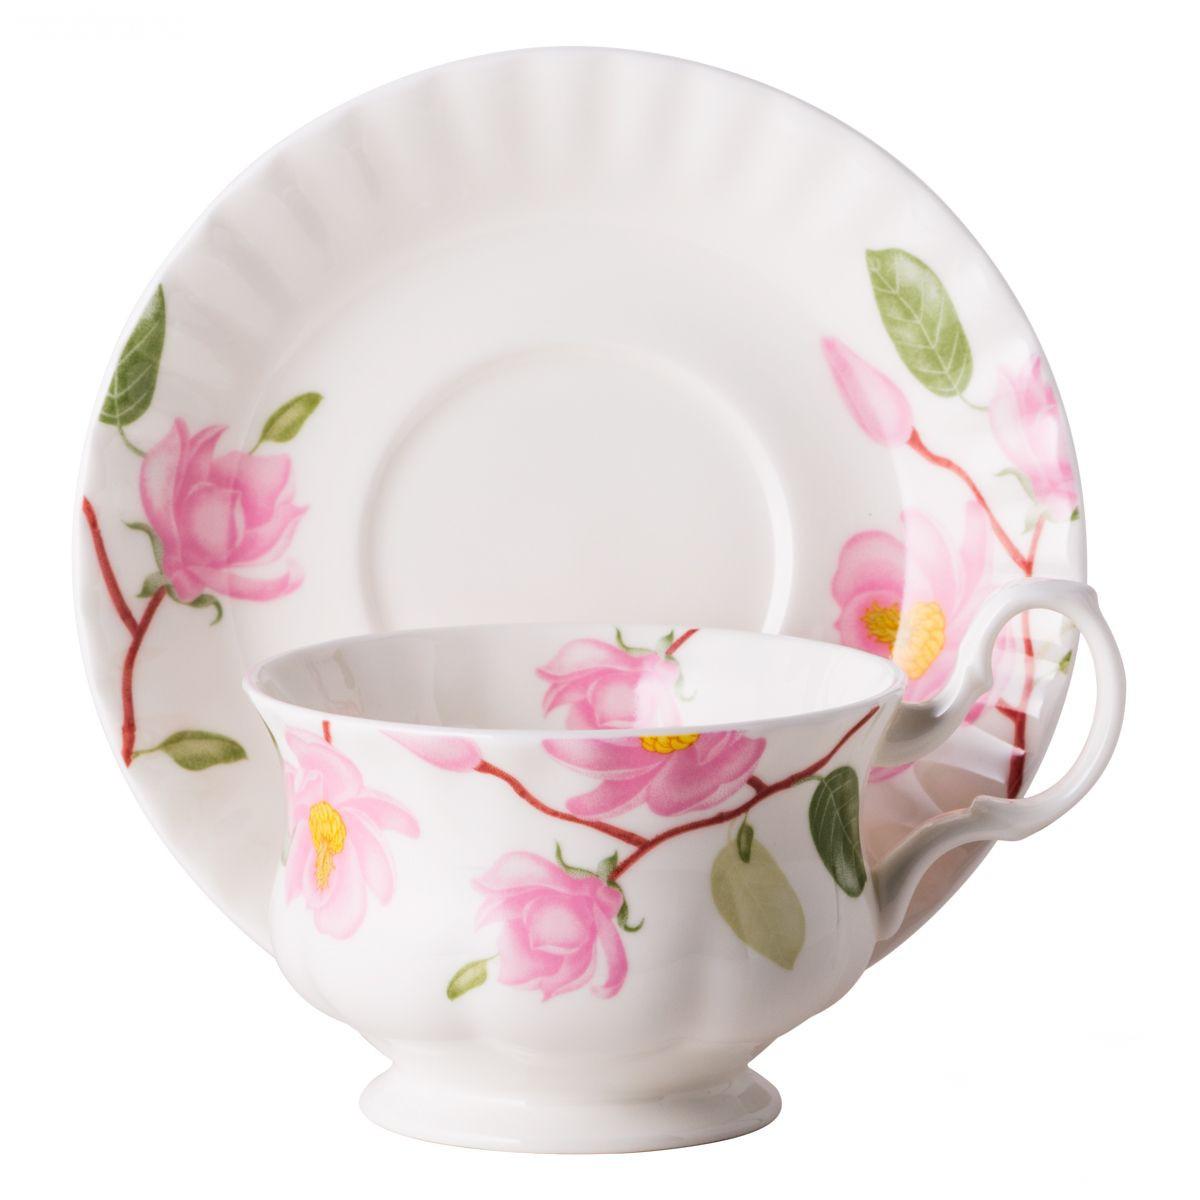 Фото - Чайная пара для завтрака Top Art Studio Цветущая магнолия 400 мл чайная пара top art studio королева эстева роз 300 мл